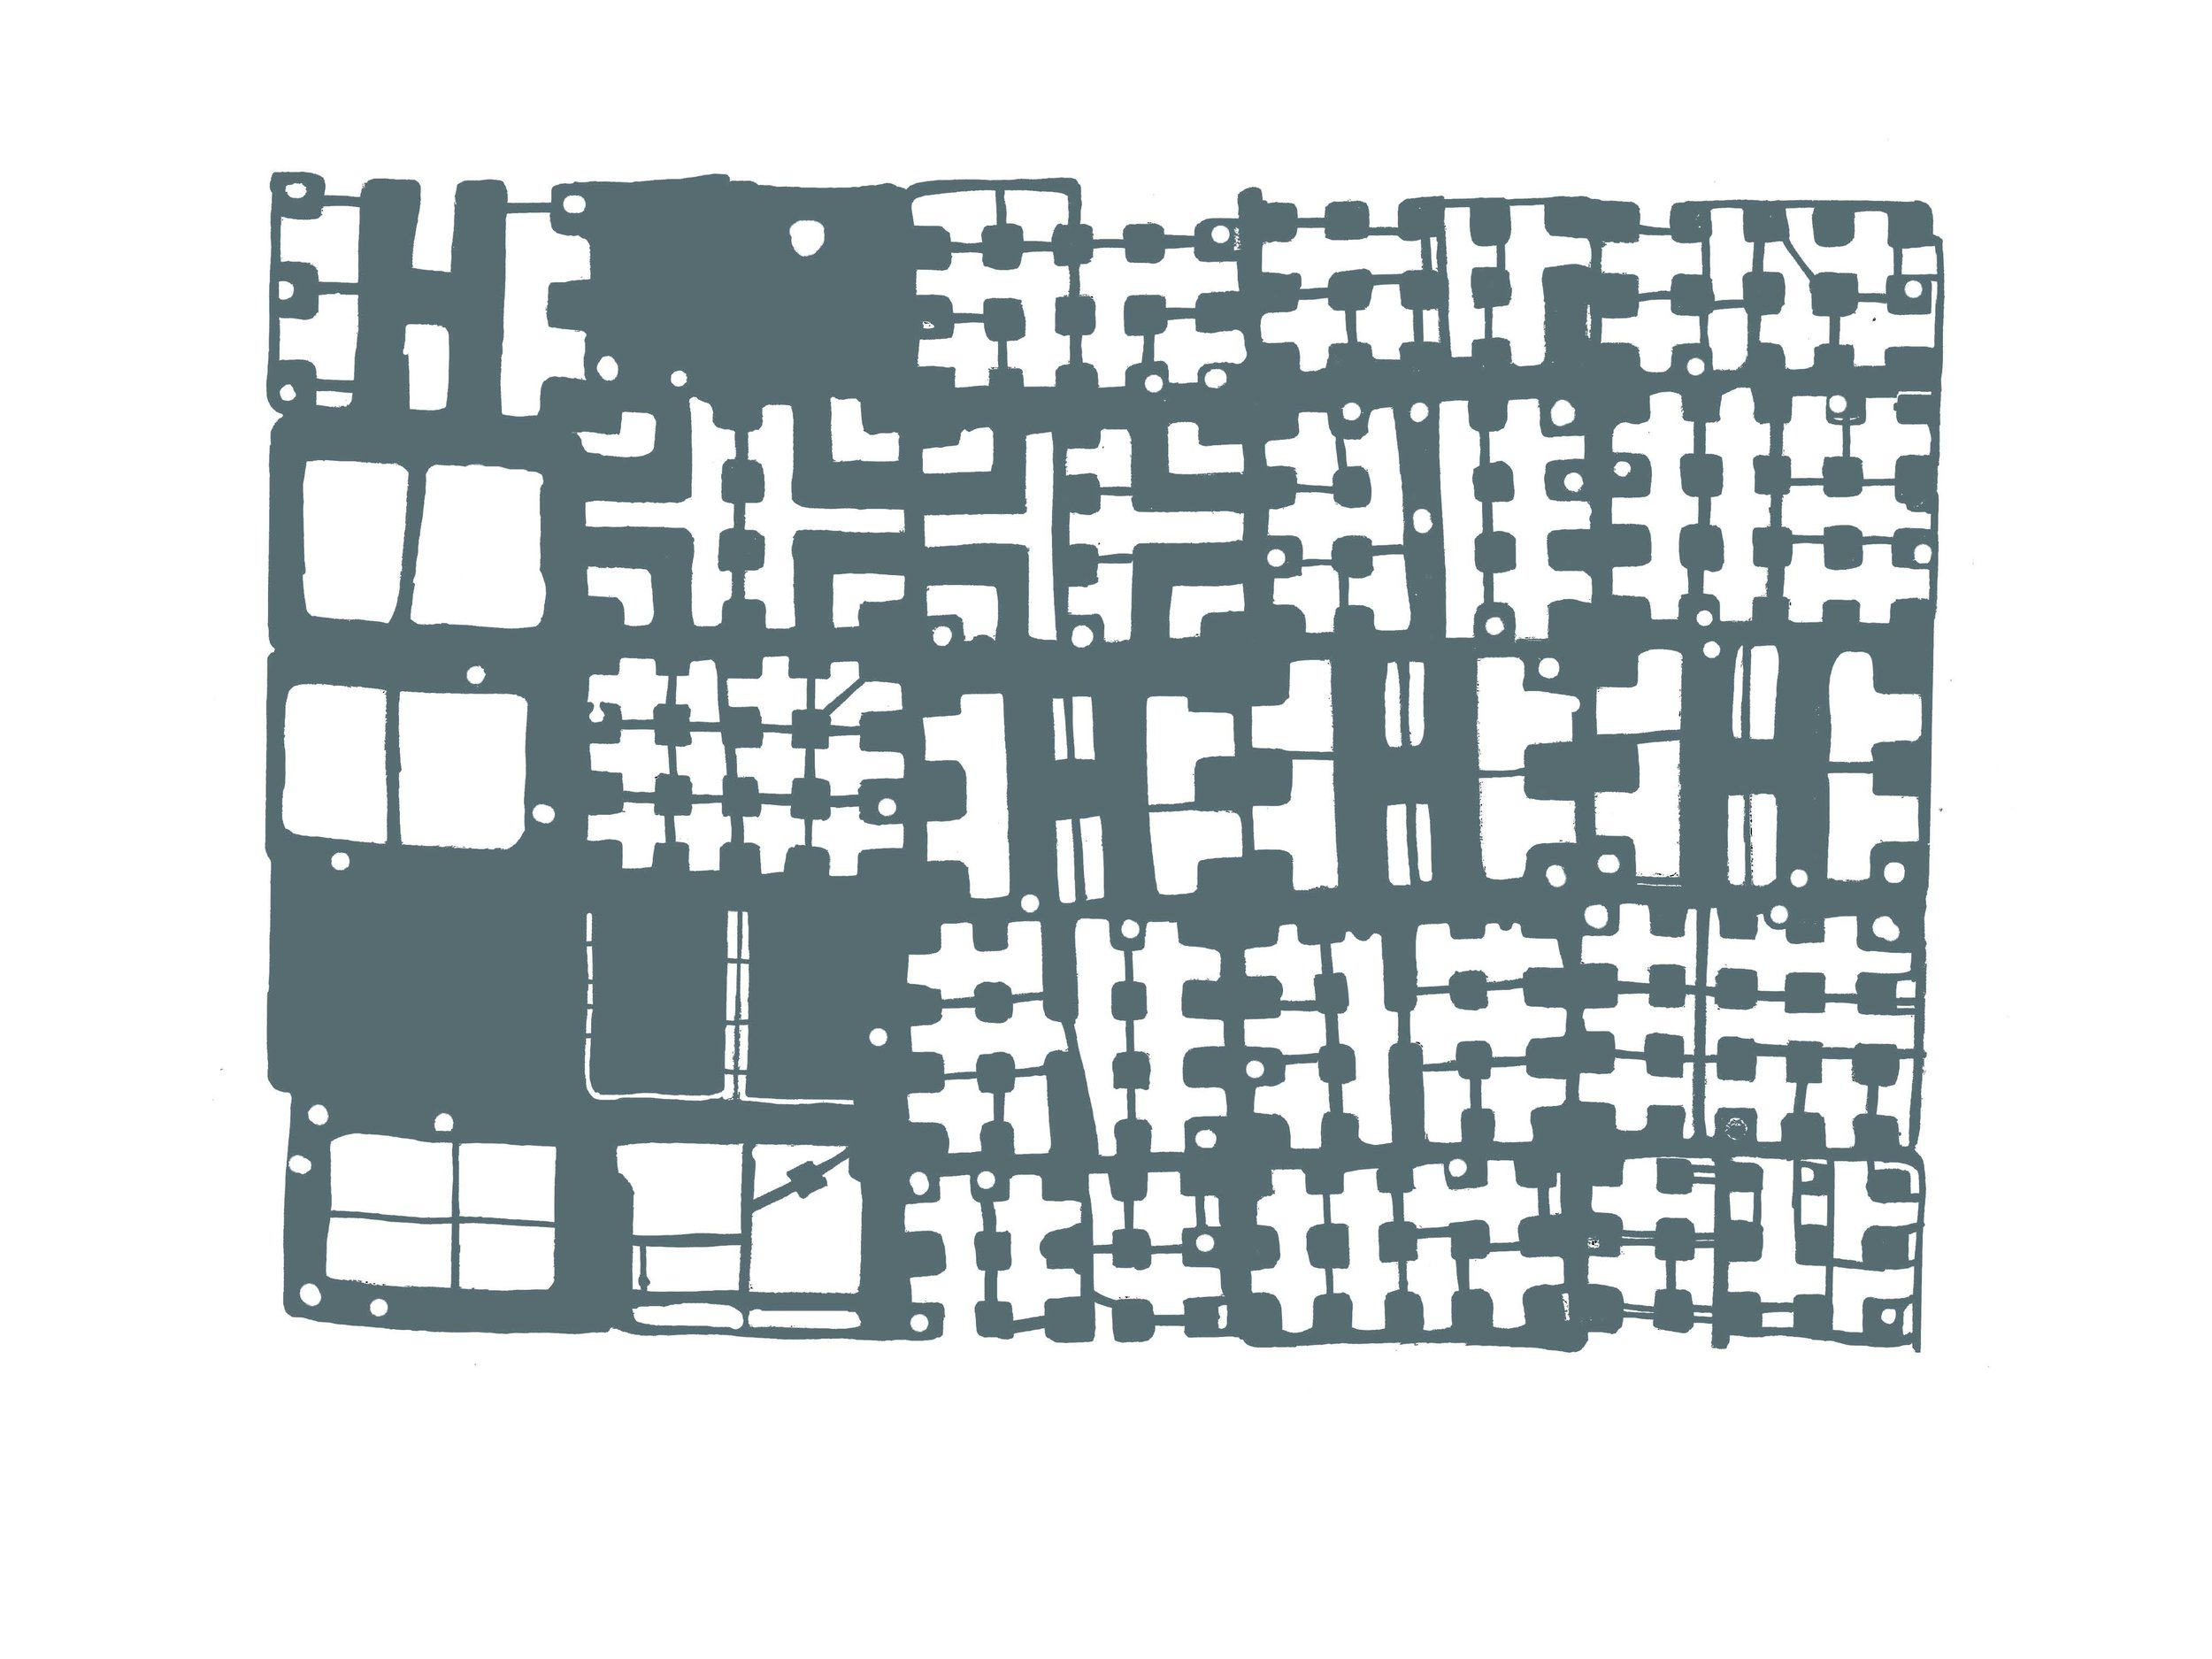 3OF3 - PG02 CYCLE 3 - ZOE ALEXANDRIA PATON BURT_Page_02.jpg